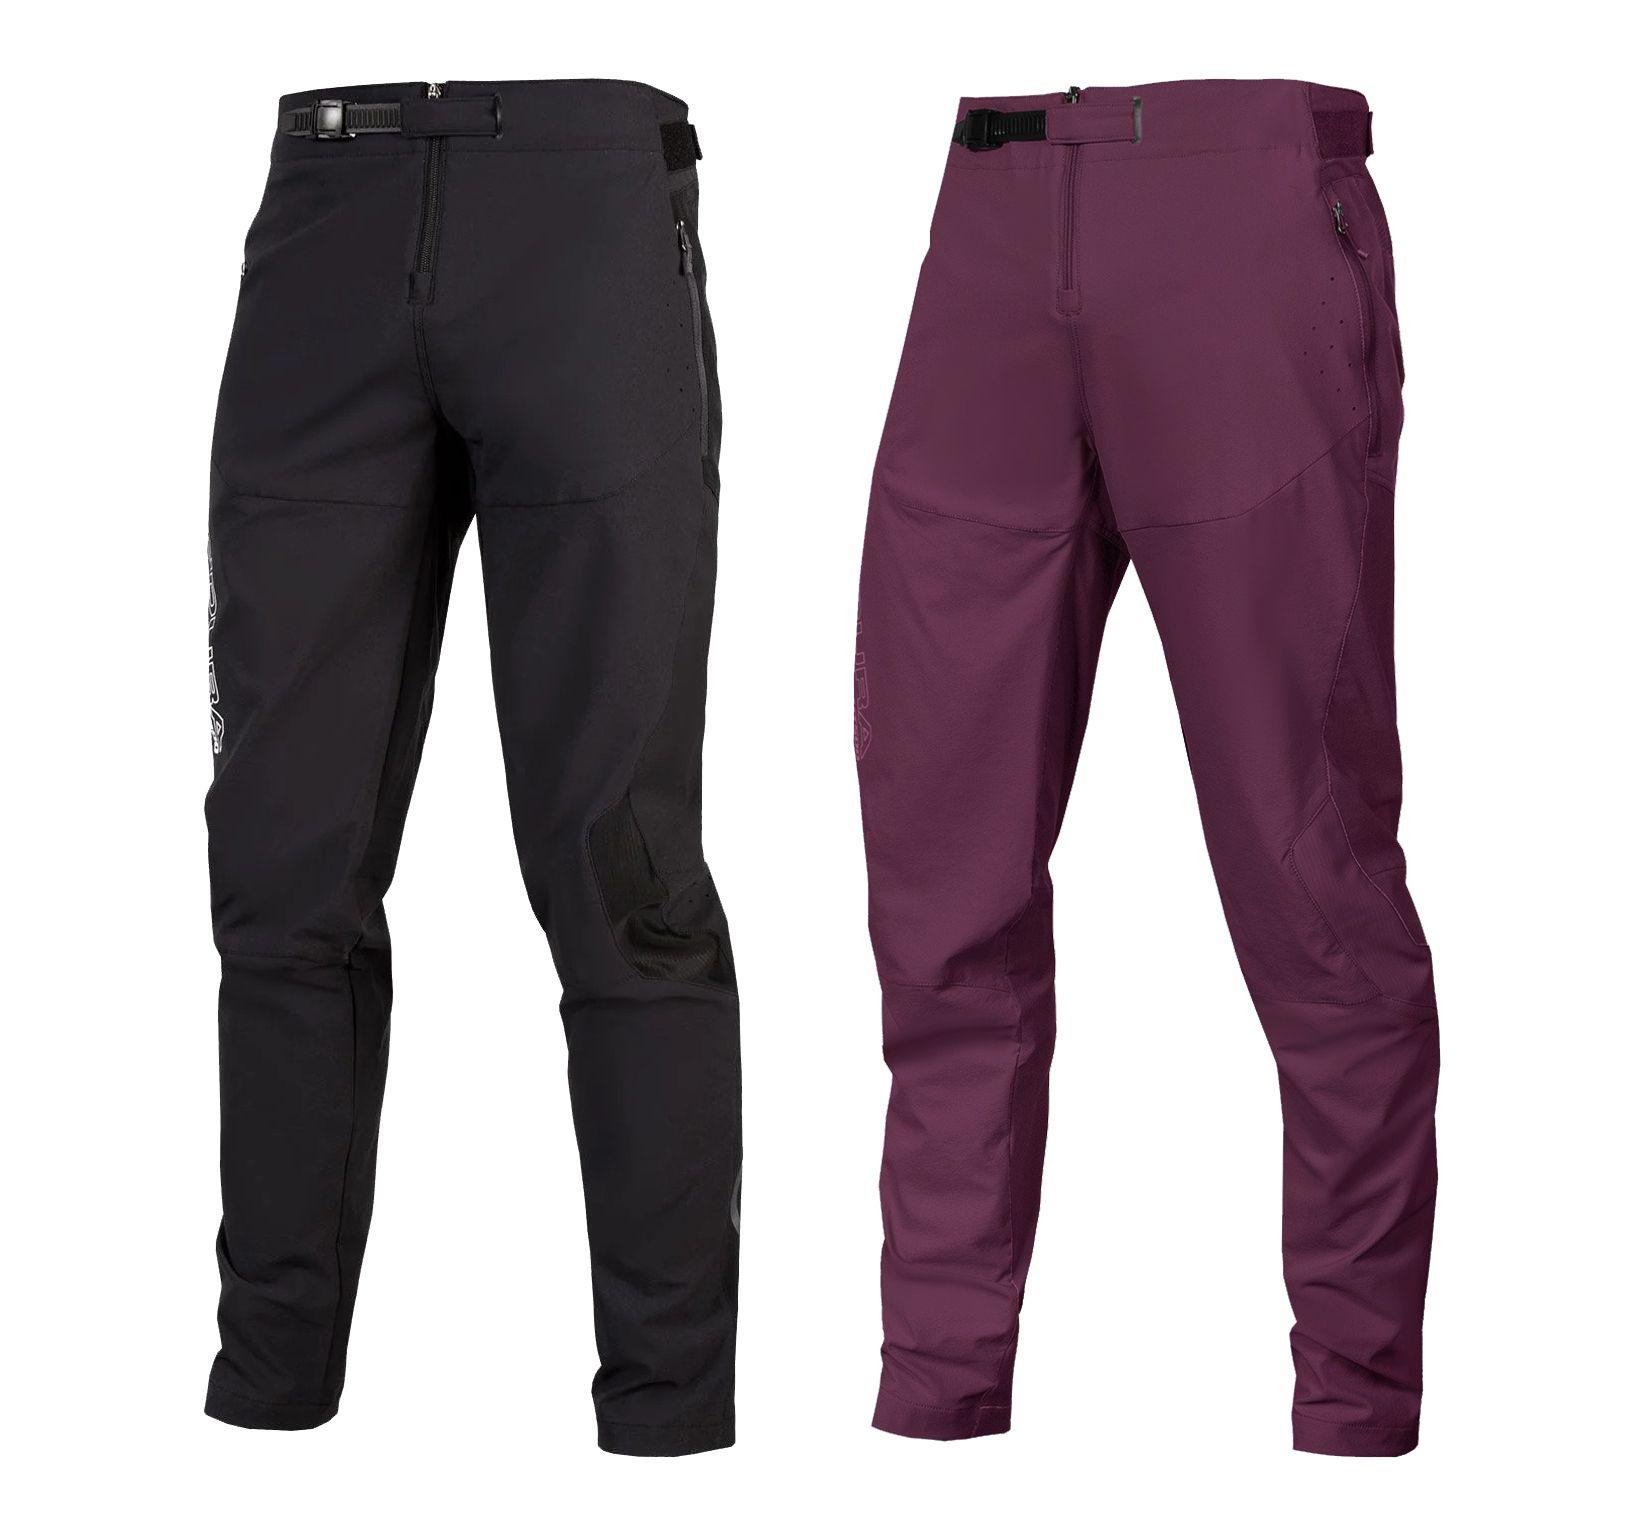 Endura - Mt500 Burner | bike pants